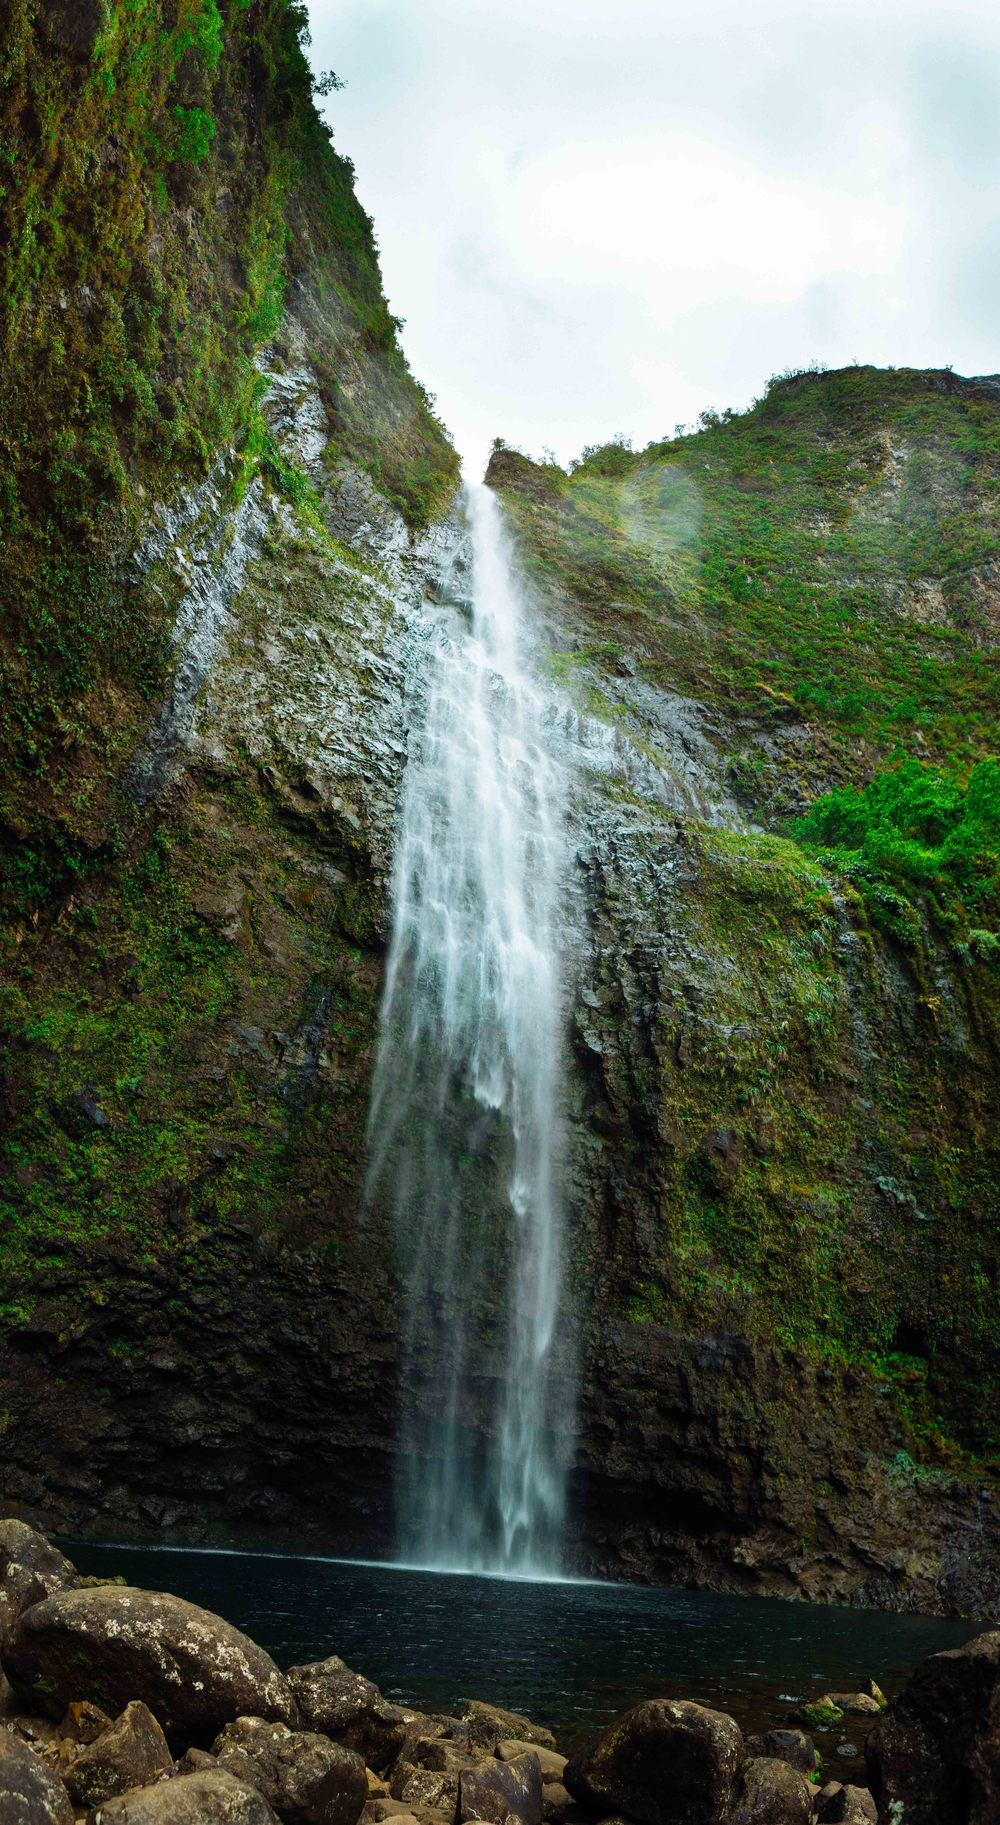 Kauai_day2_-273-Pano-2.jpg